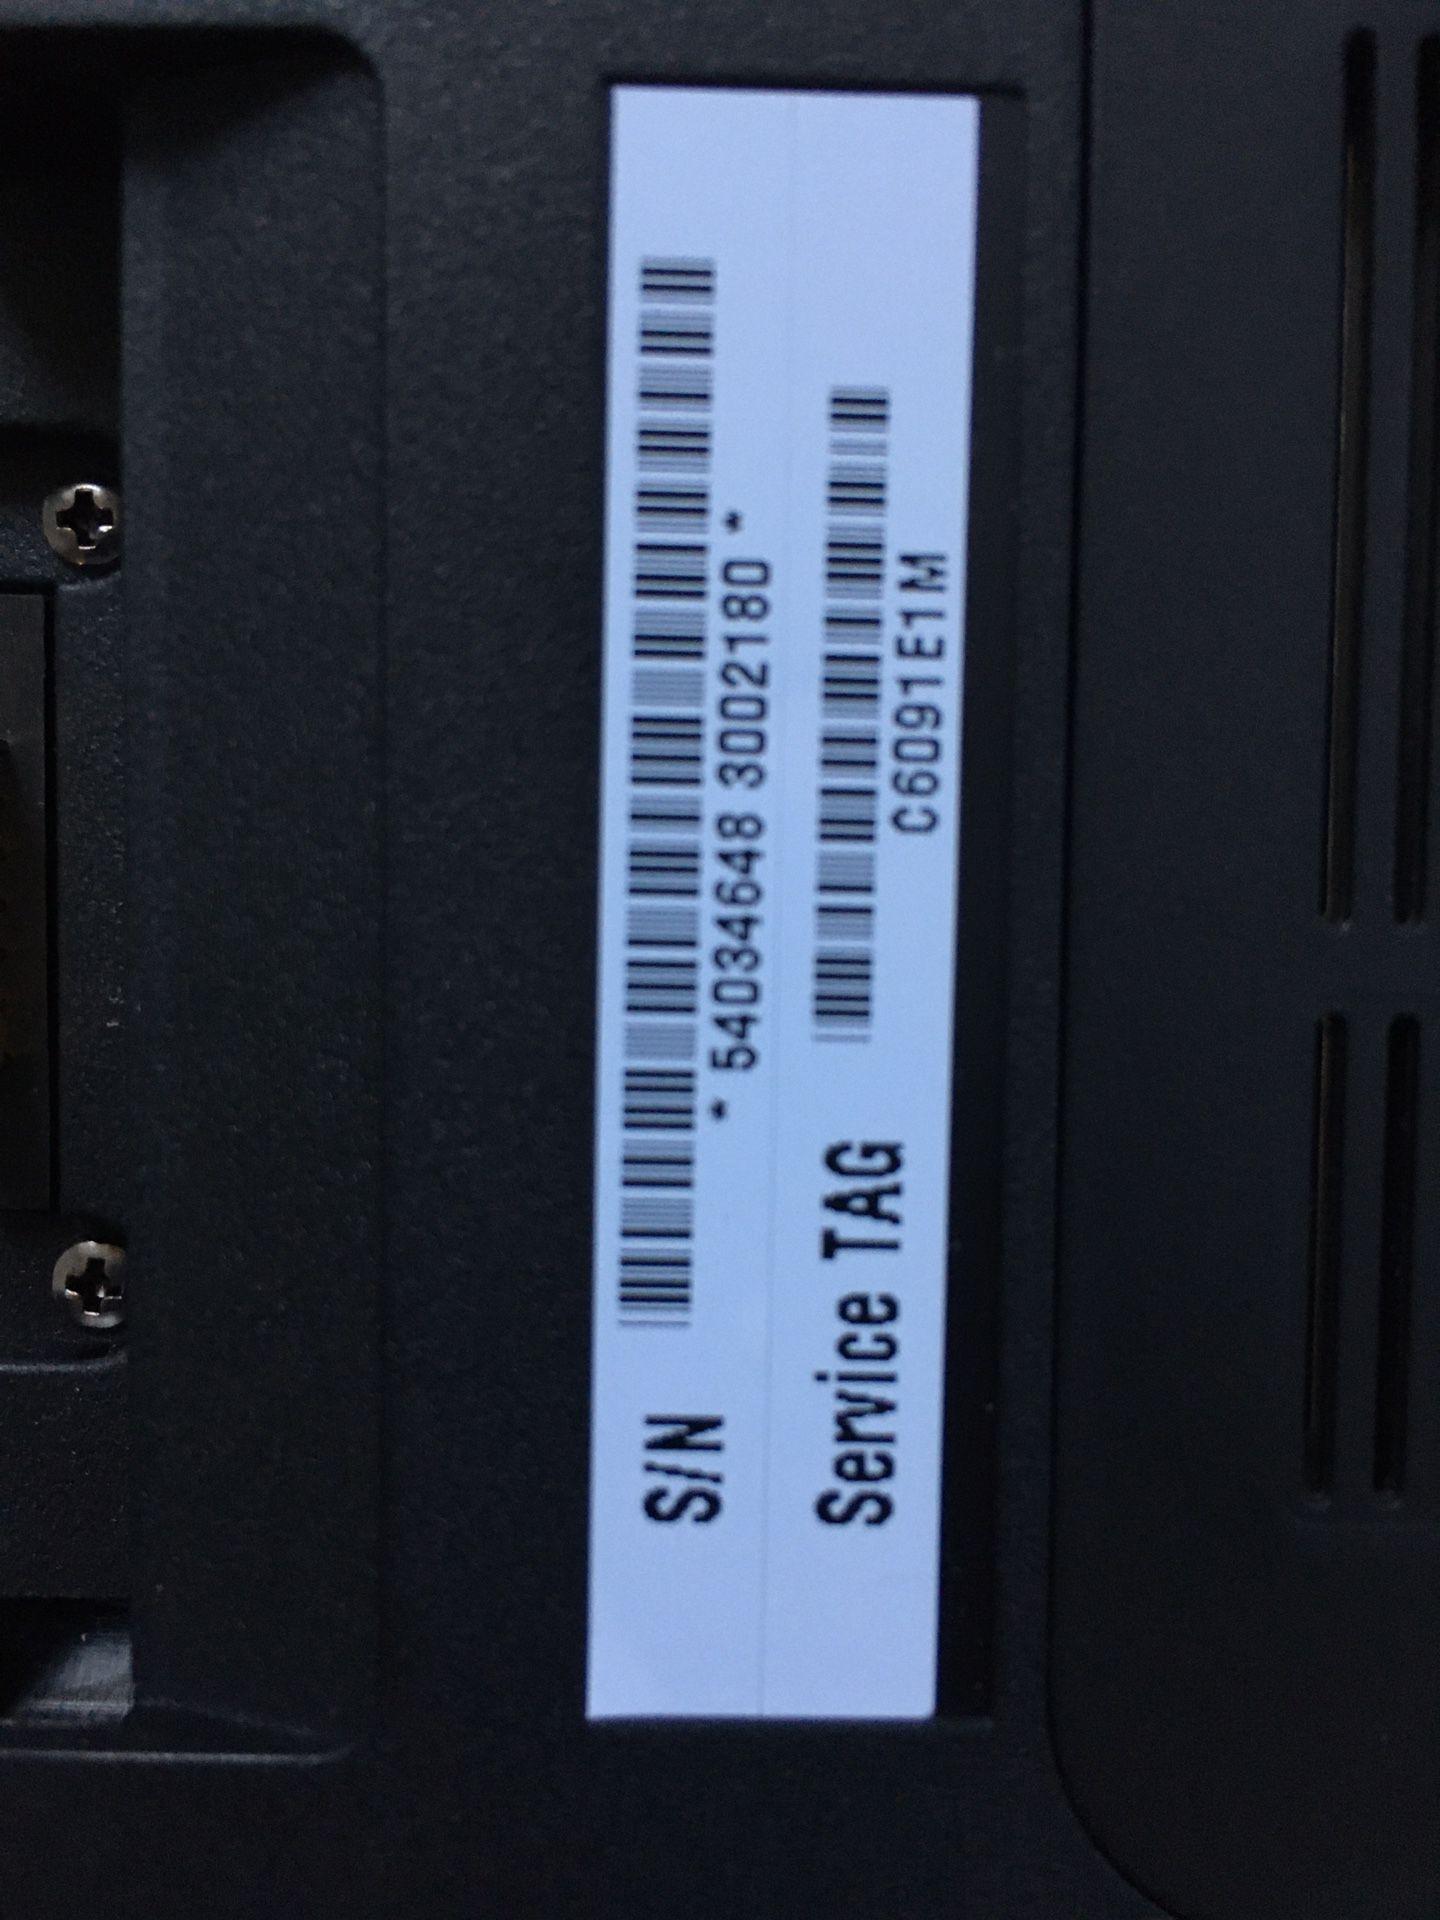 "Sony VIAO Laptop, 16.4"" Screen, i7 Core, 320GB HDD, 4GB RAM, Windows 10 Pro, SN#54034648 3002180 (New, Open Box)"